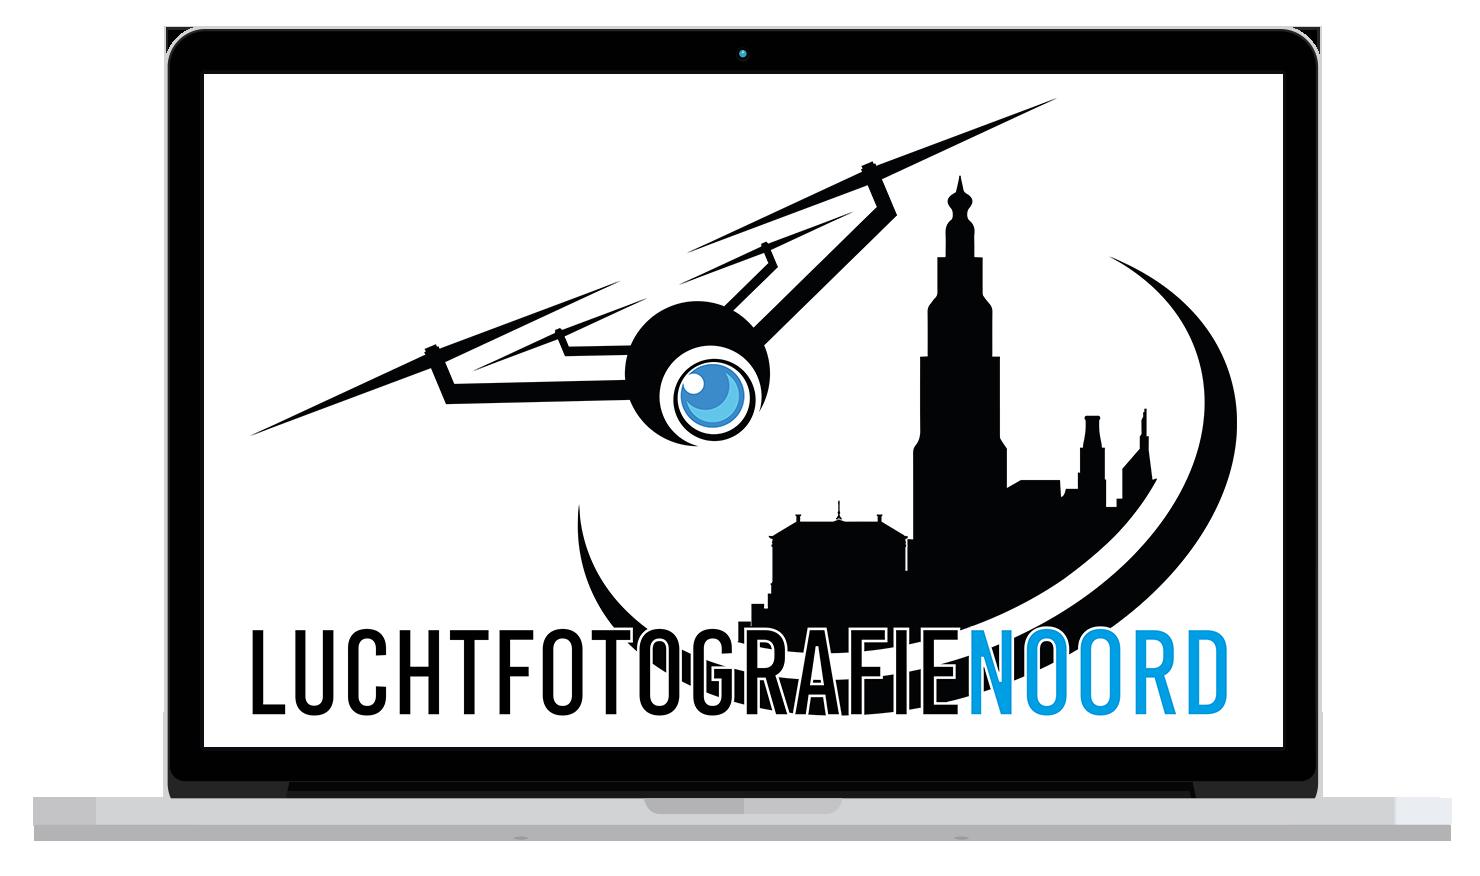 Luchtfotografienoord logo